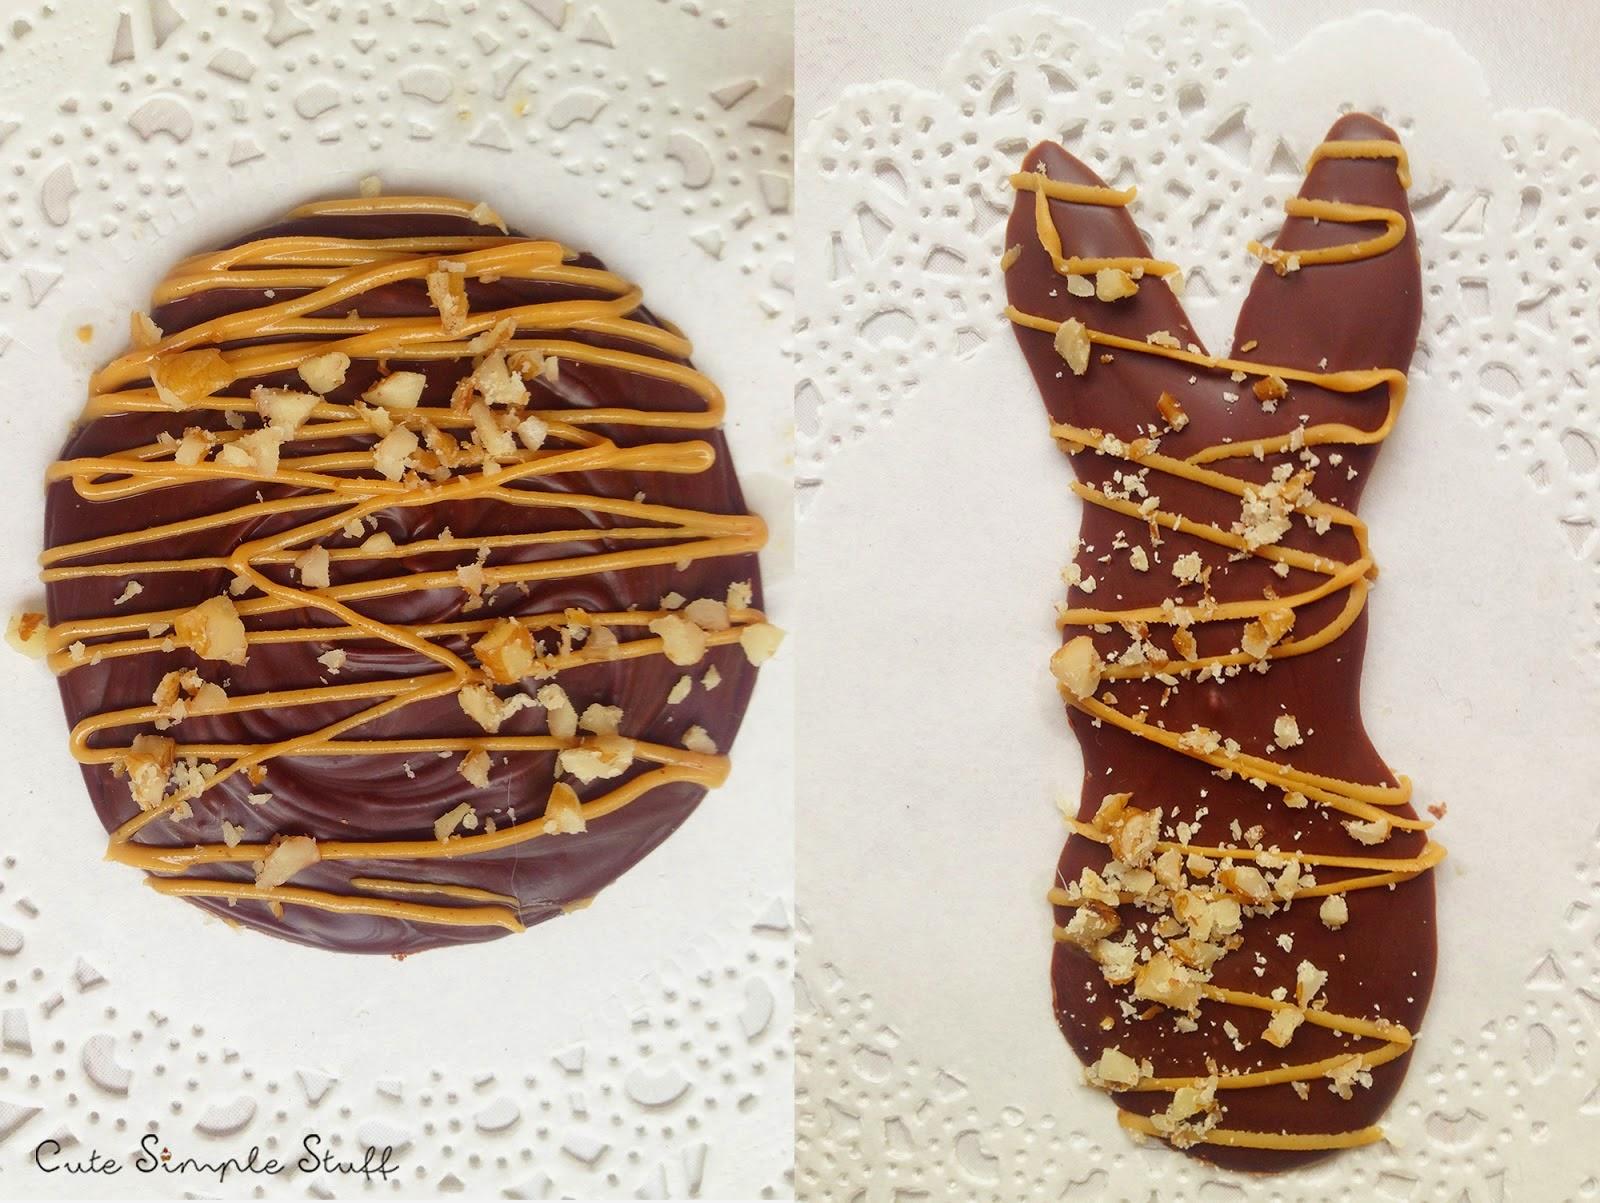 http://www.cutesimplestuff.com/2015/03/easy-chocolate-easter-bunny-treat.html